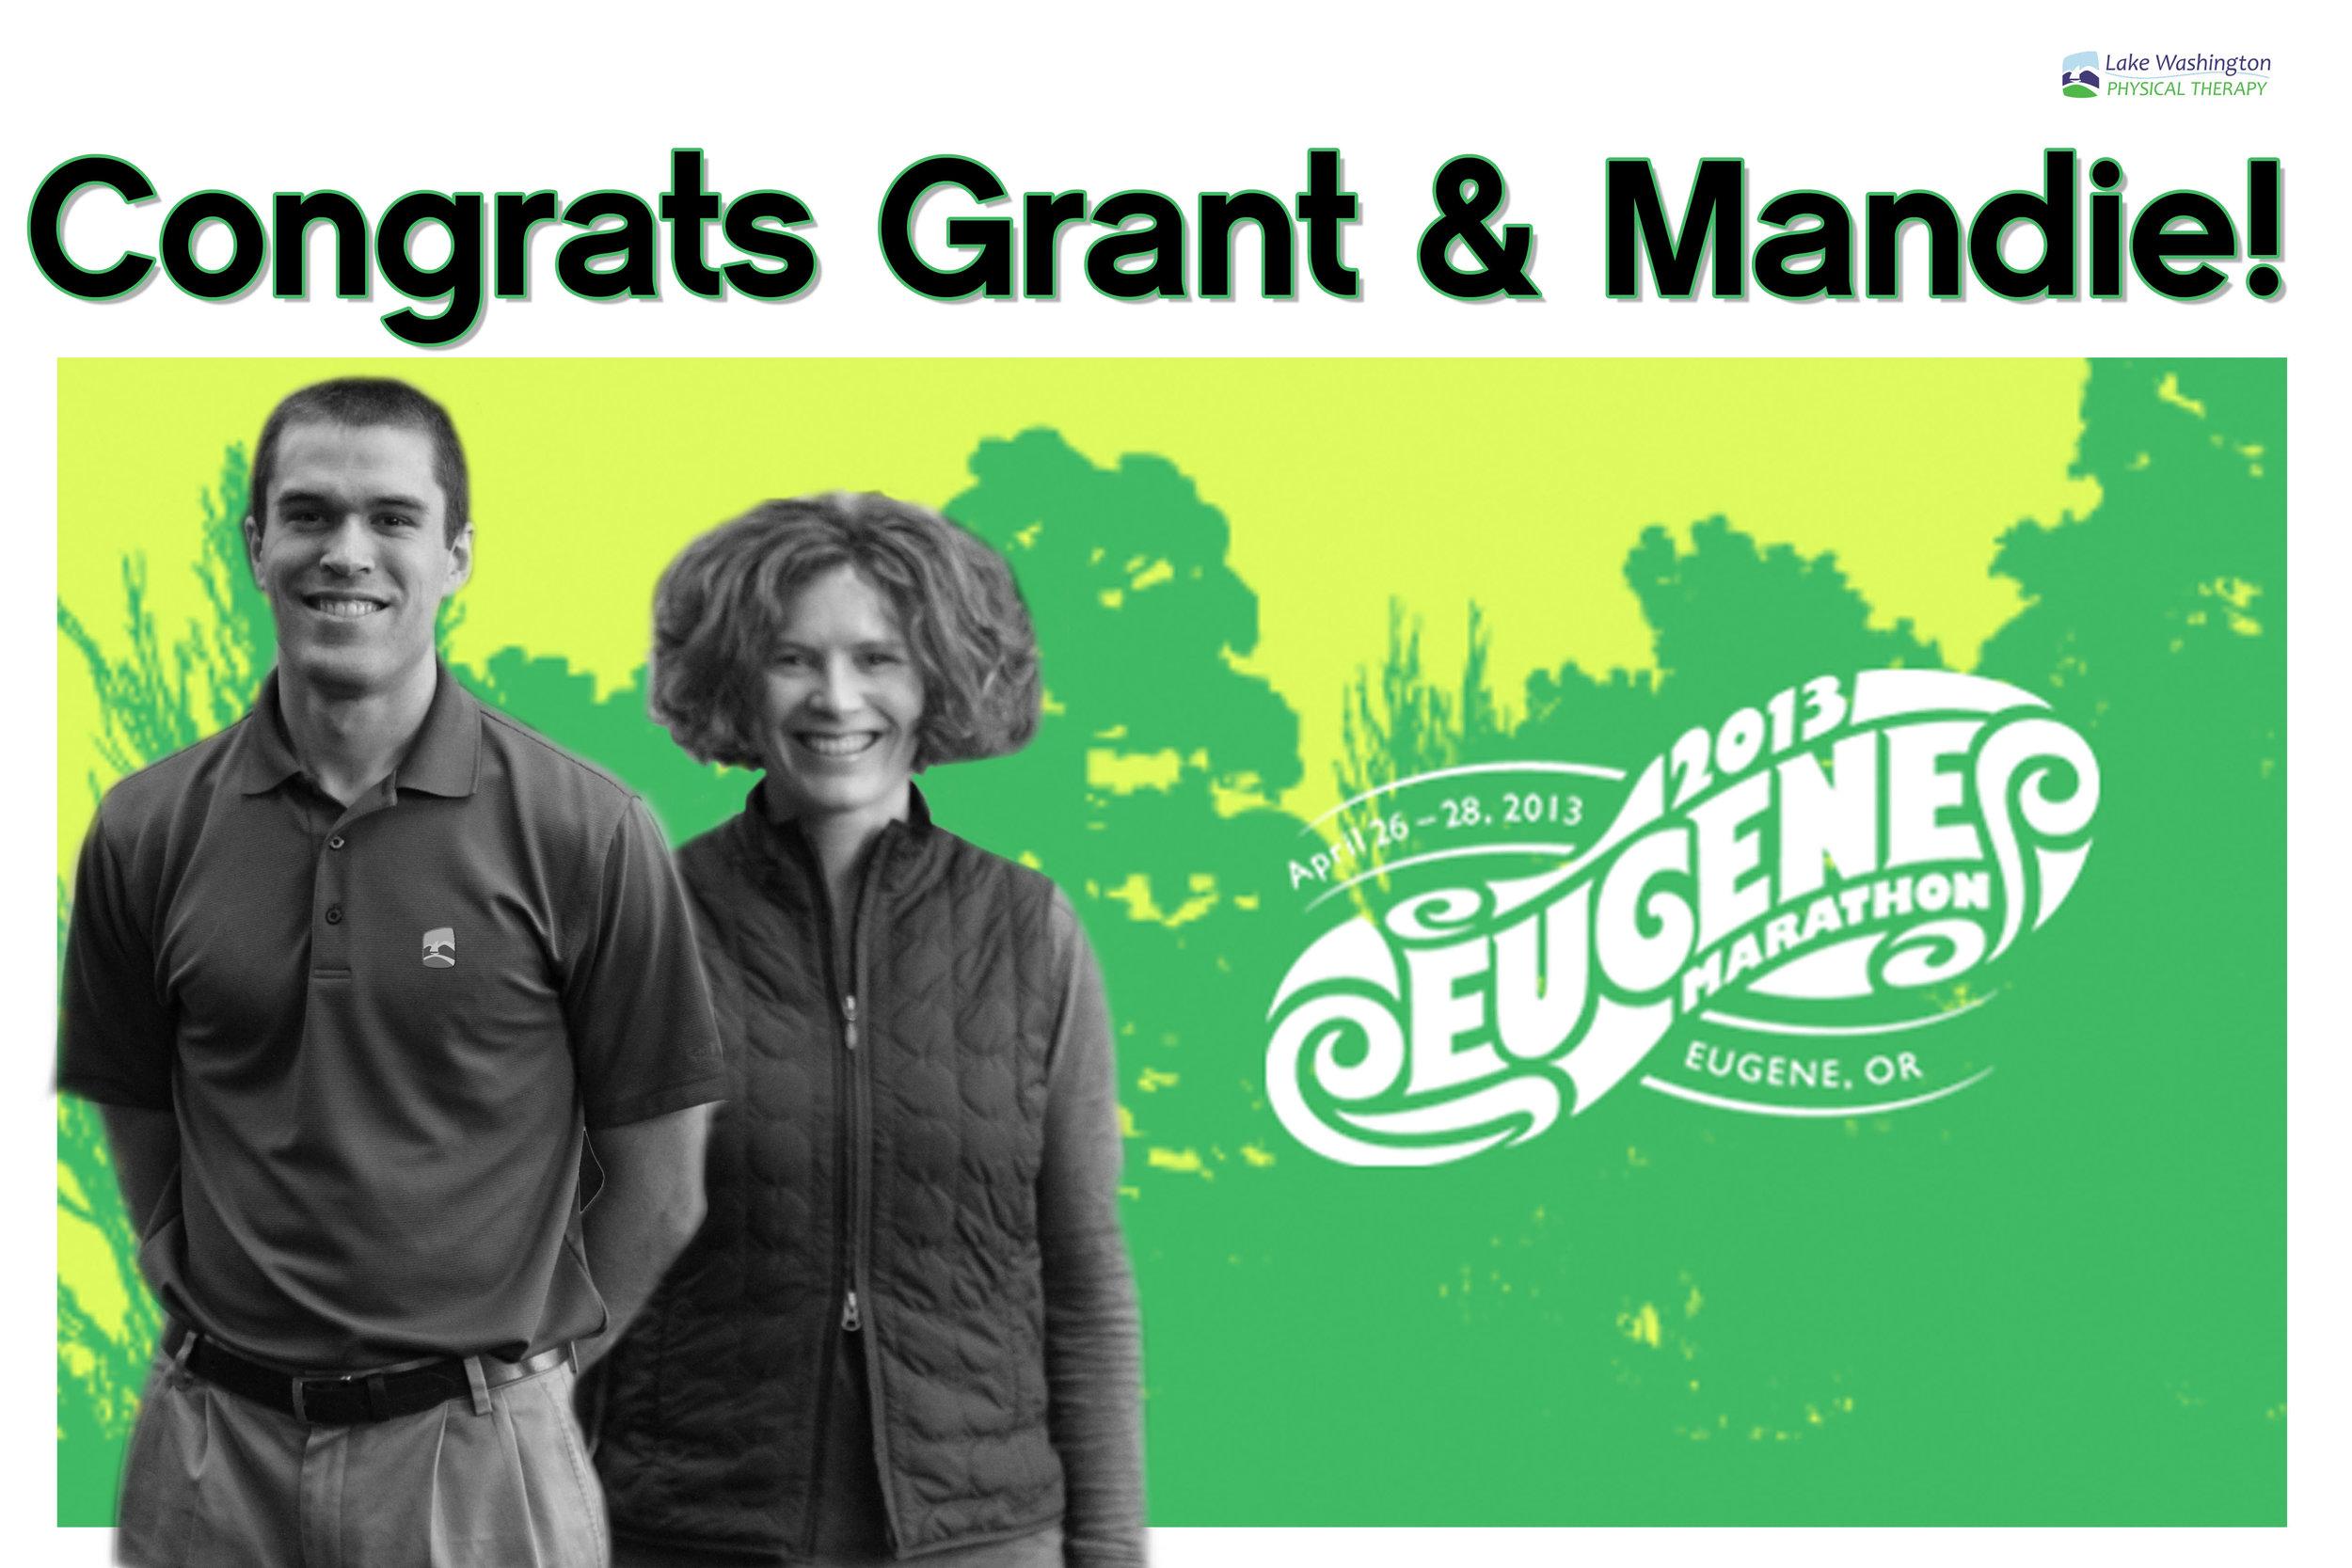 LWPT Congrats Grant & Mandie.jpg